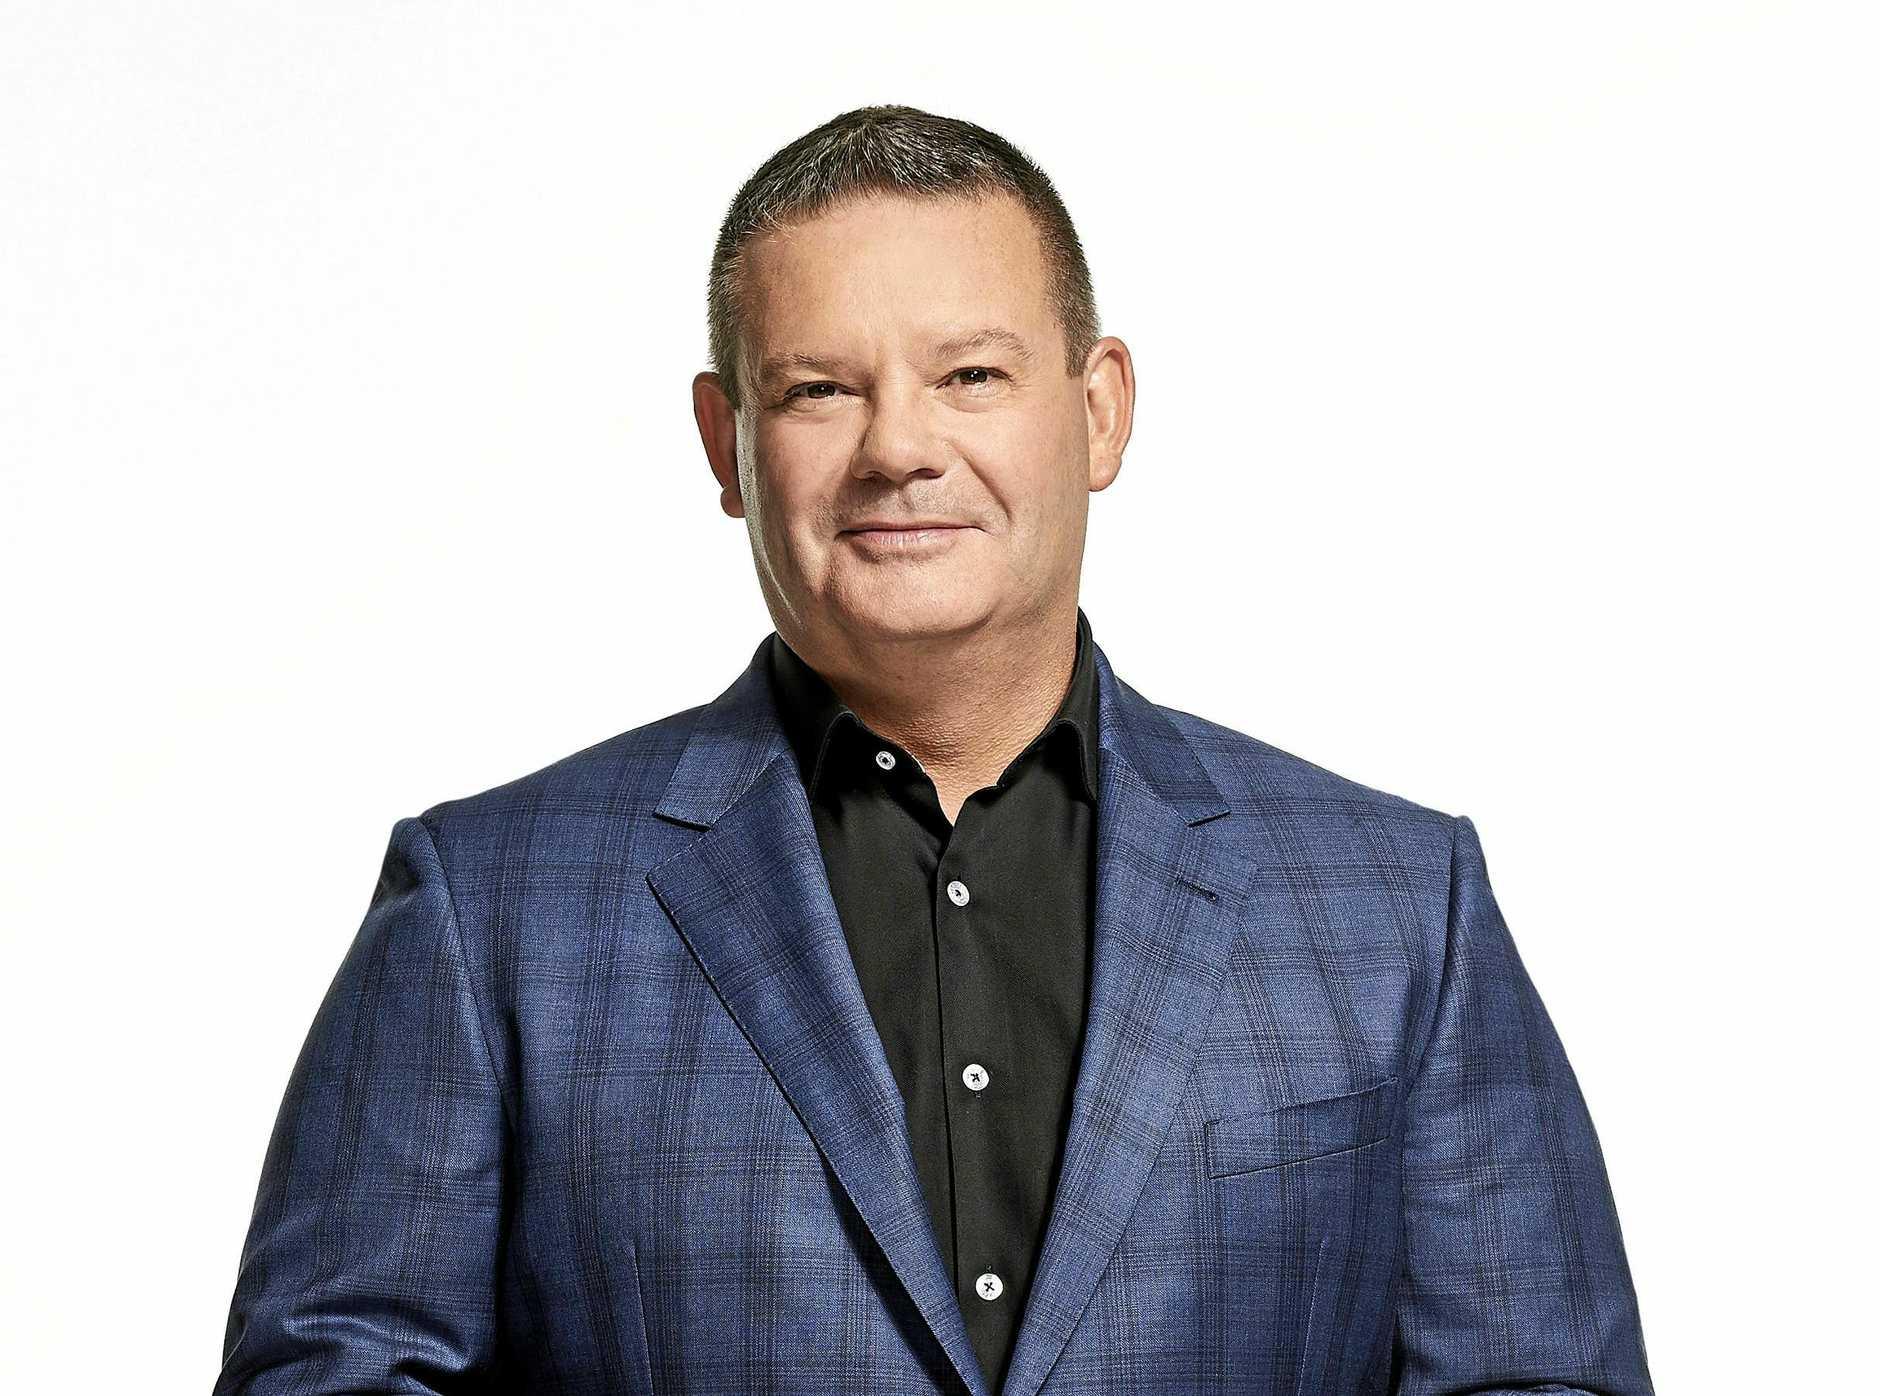 MasterChef Australia judge Gary Mehigan loves it when contestants cook from scratch.